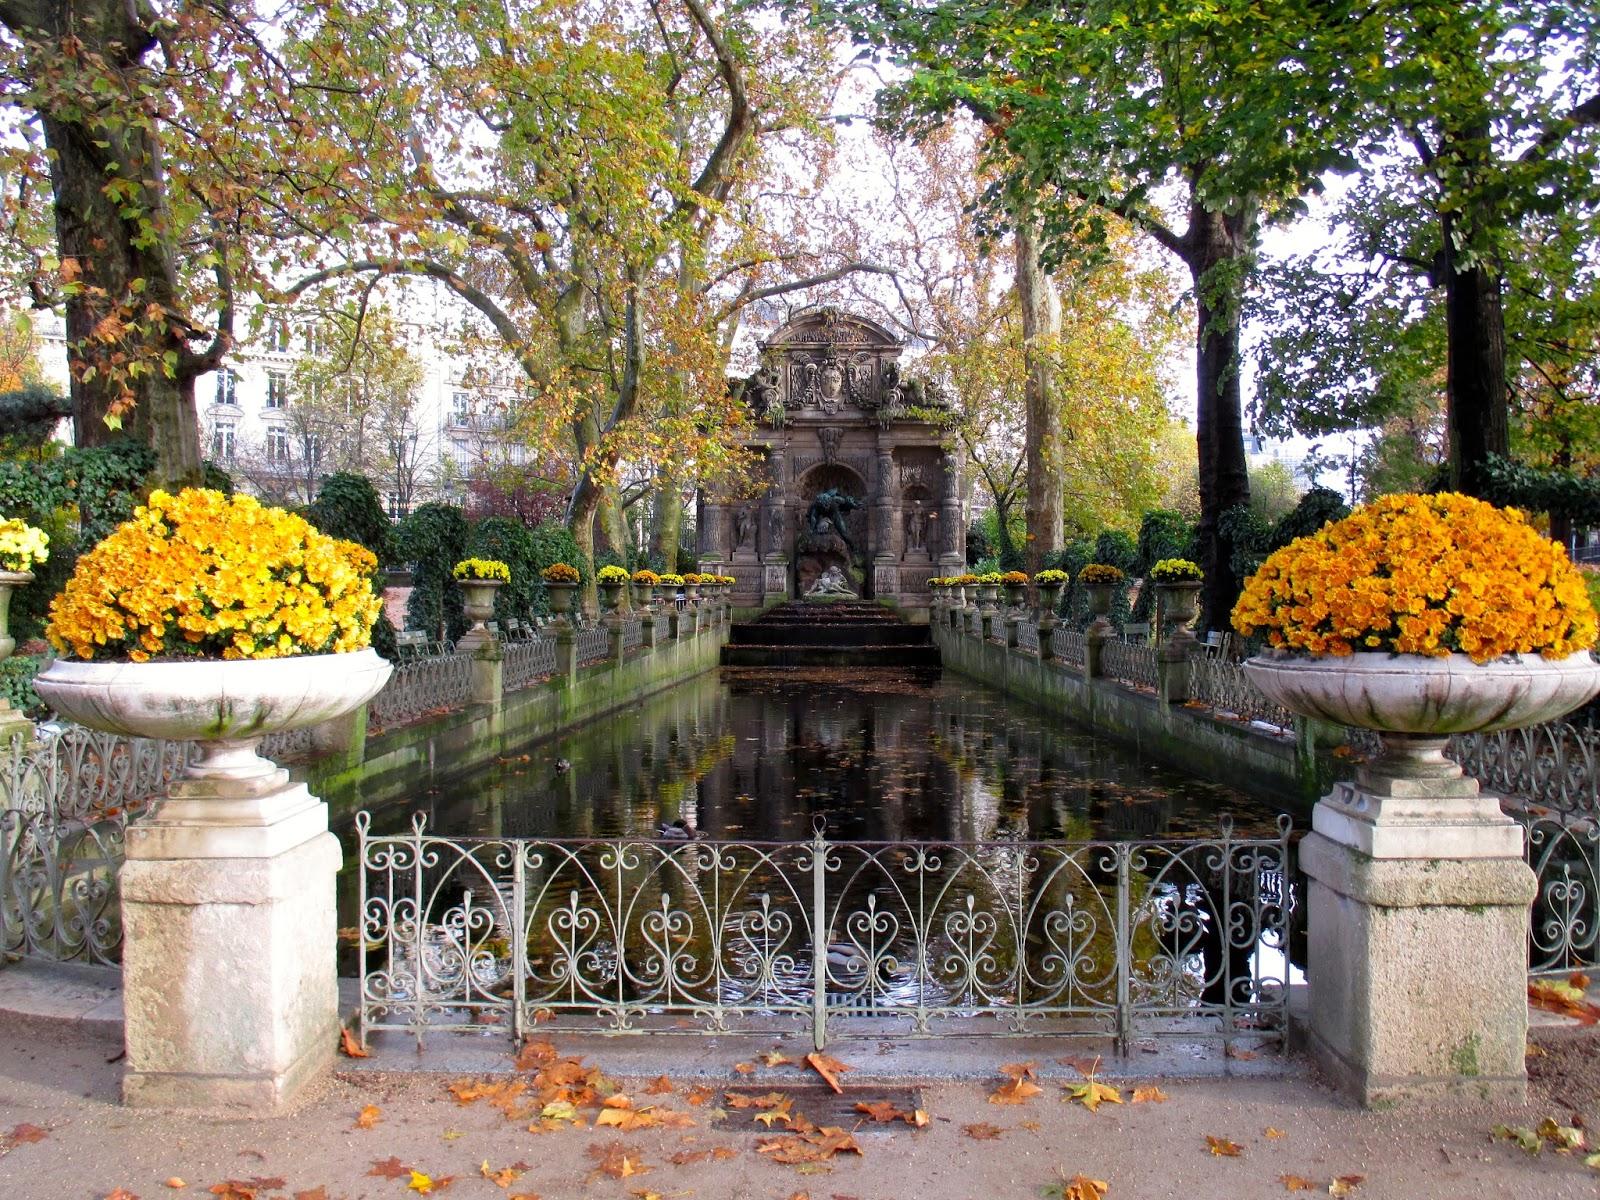 Une petite folie jardin du luxembourg for Jardin luxembourg